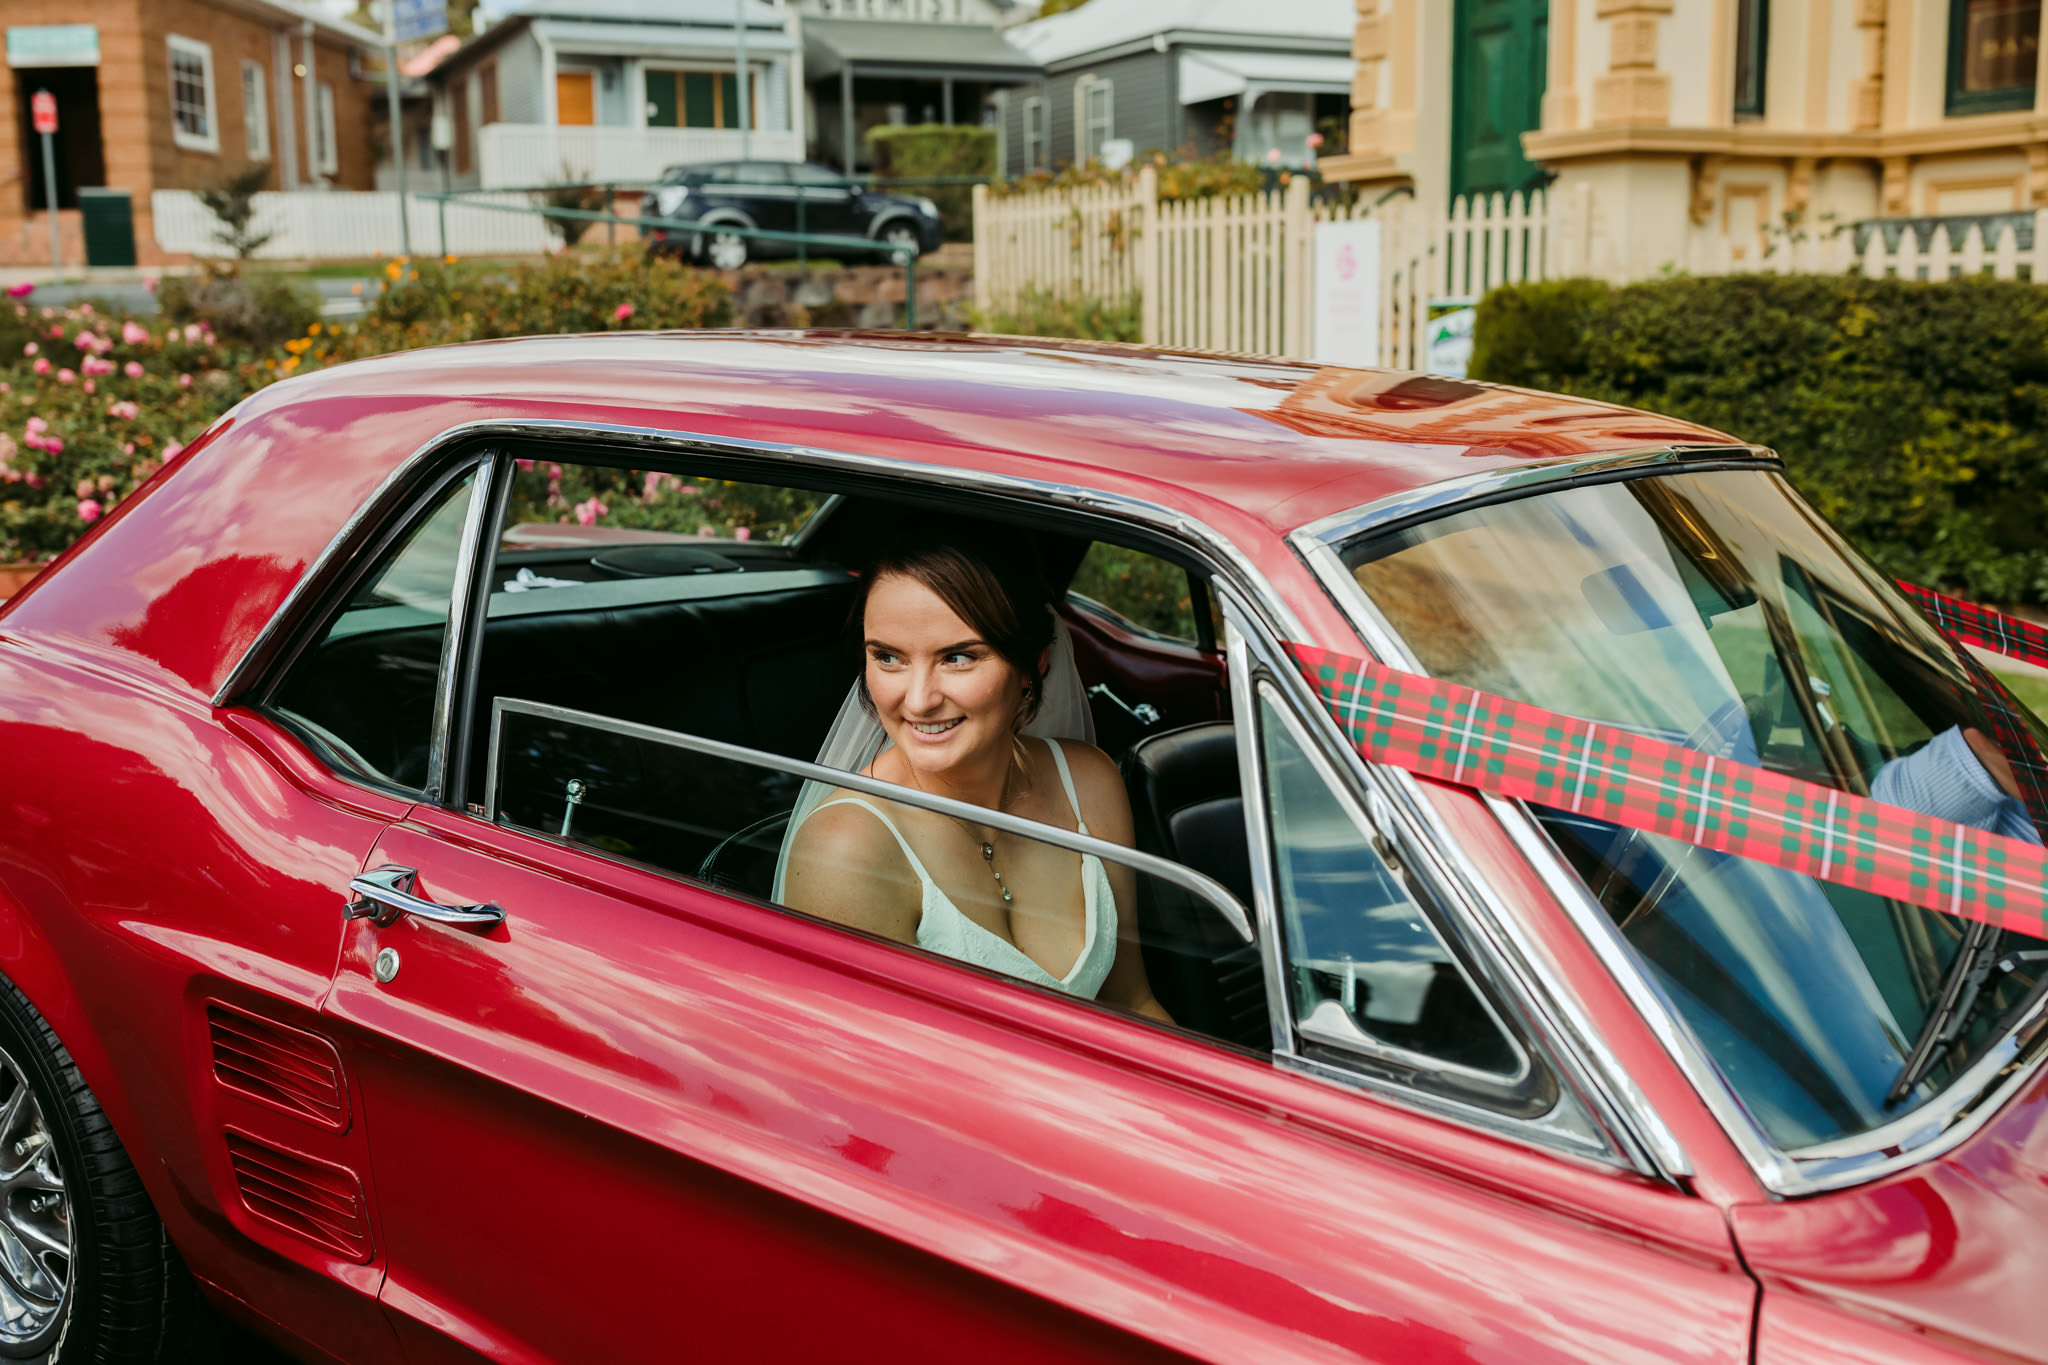 Erin Latimore Mudgee Canberra Wedding Photographer ROSEBANK GUESTHOUSE OLD THEATRE TONIC MILLTHORPE_157.JPG